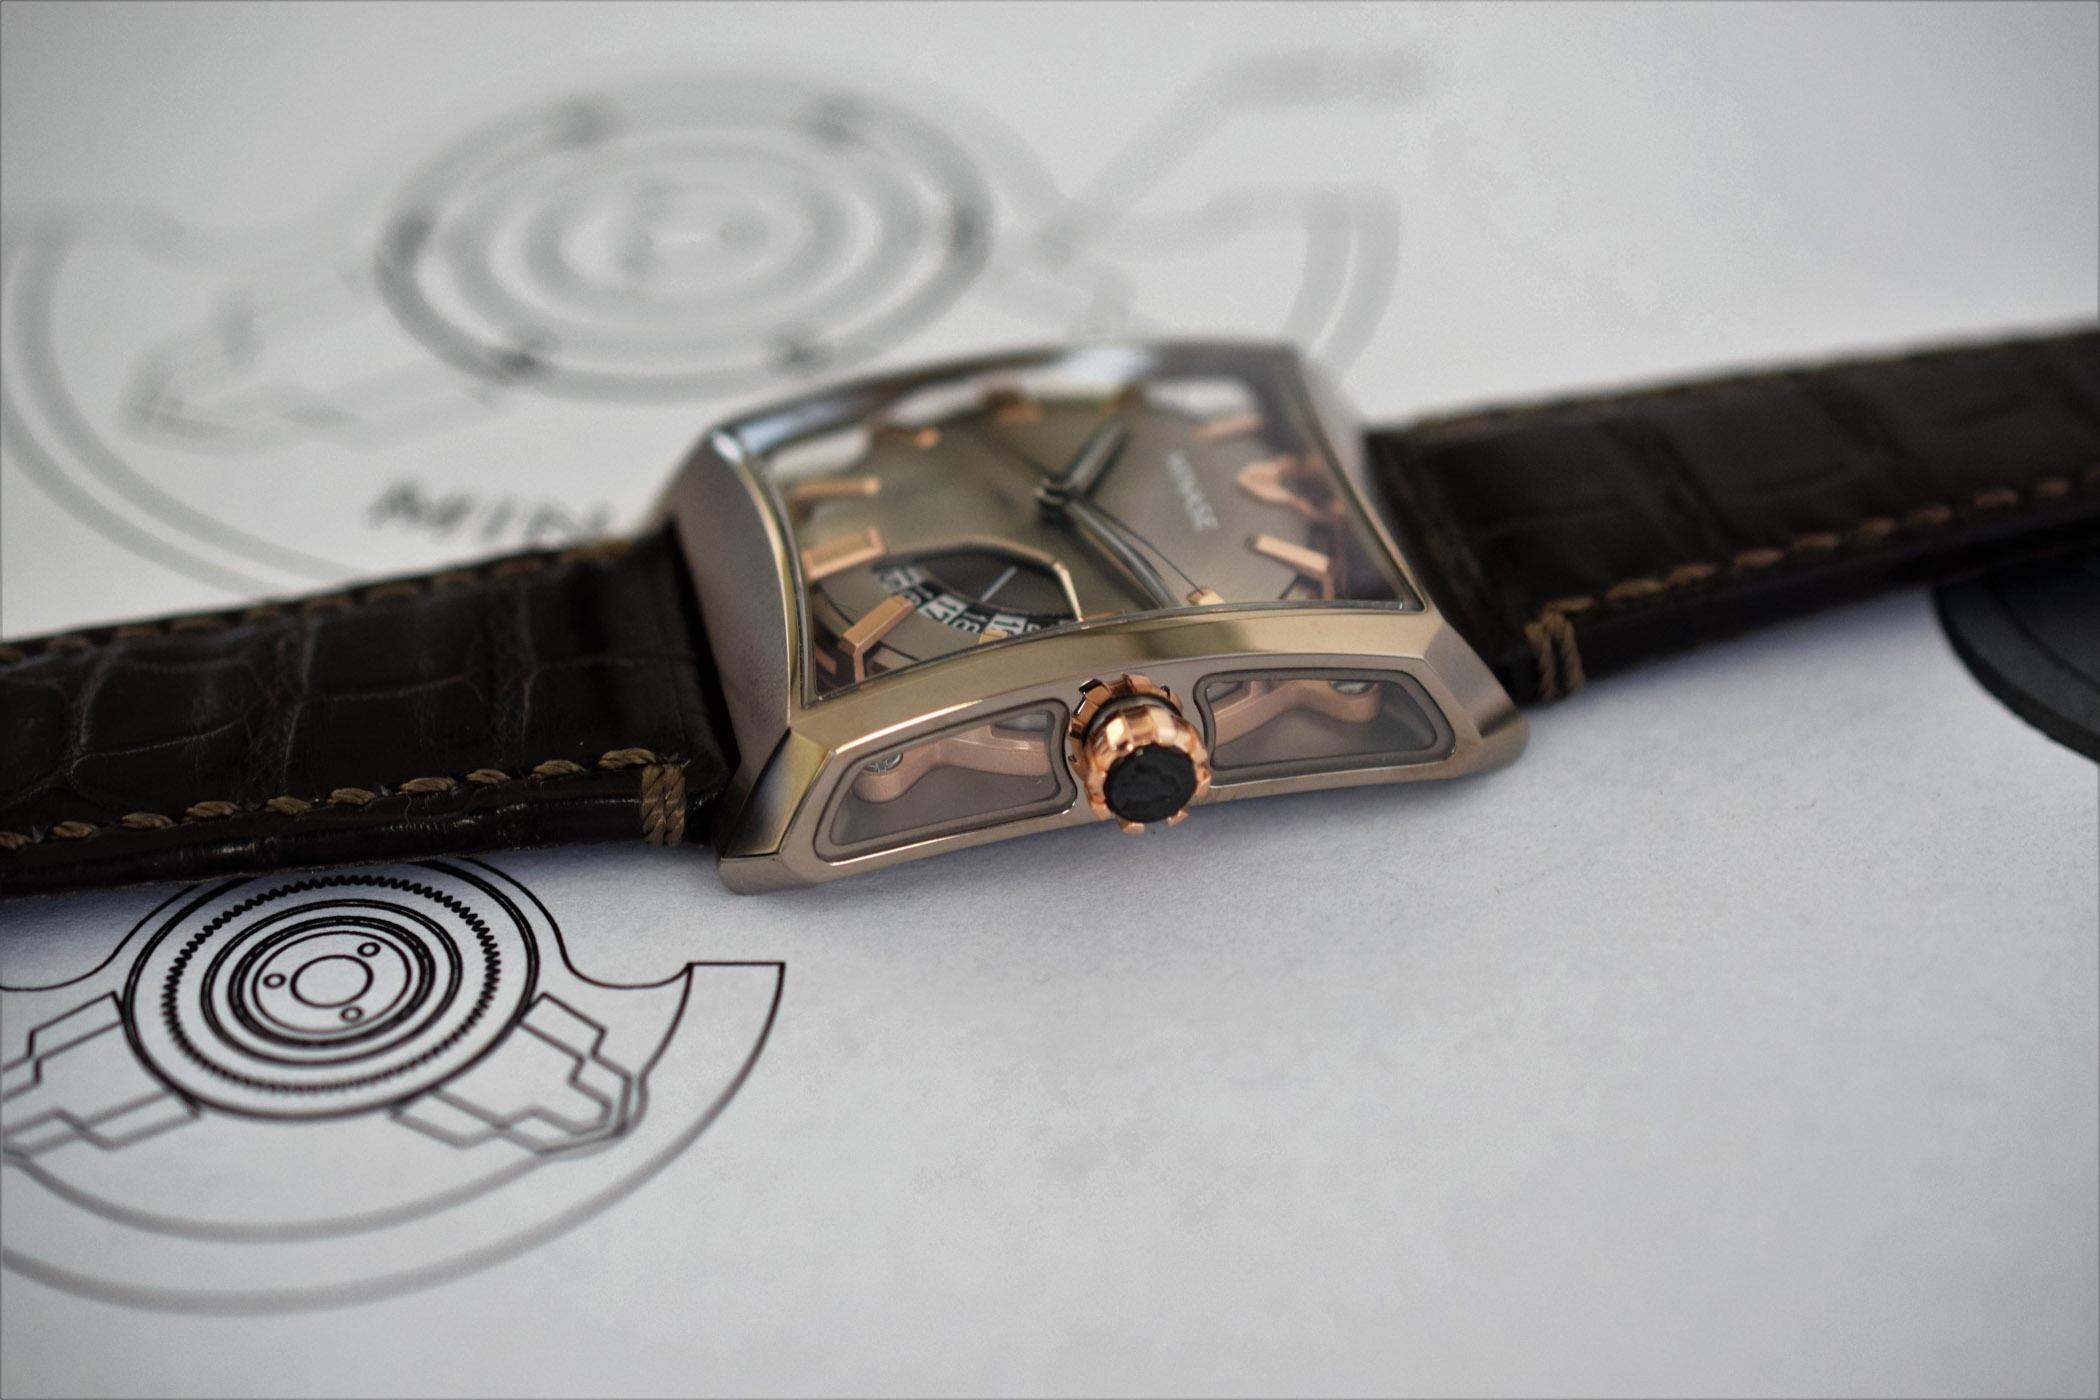 Minase watches - 2